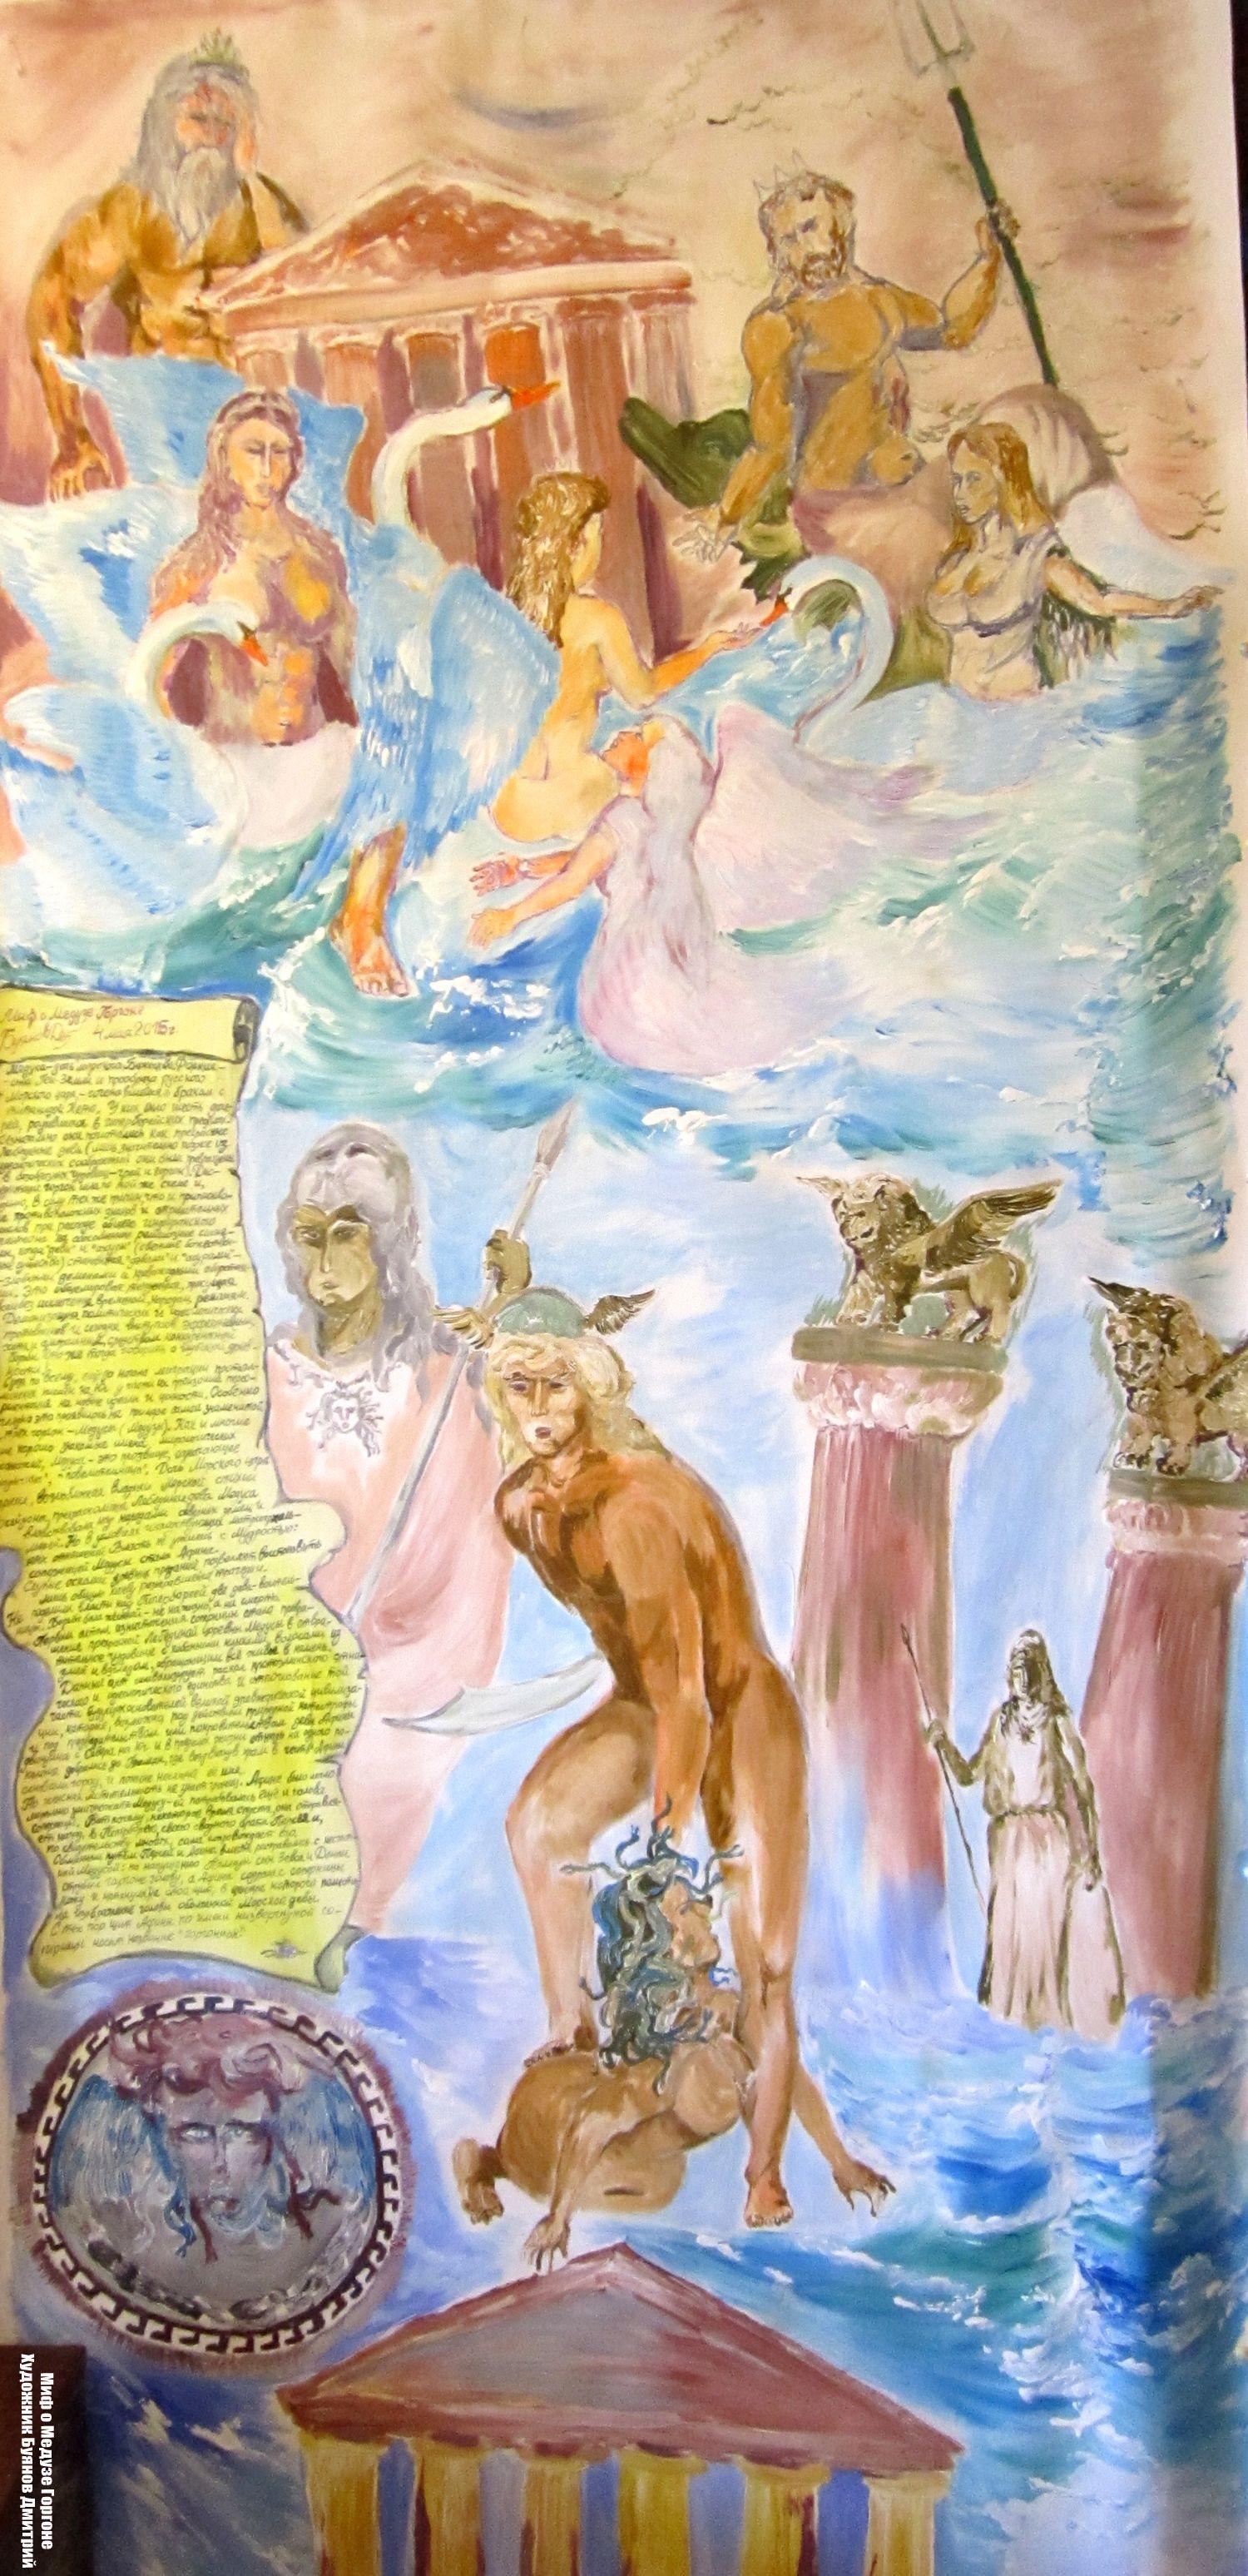 Дмитрий Юрьевич Буянов. The myth of Medusa